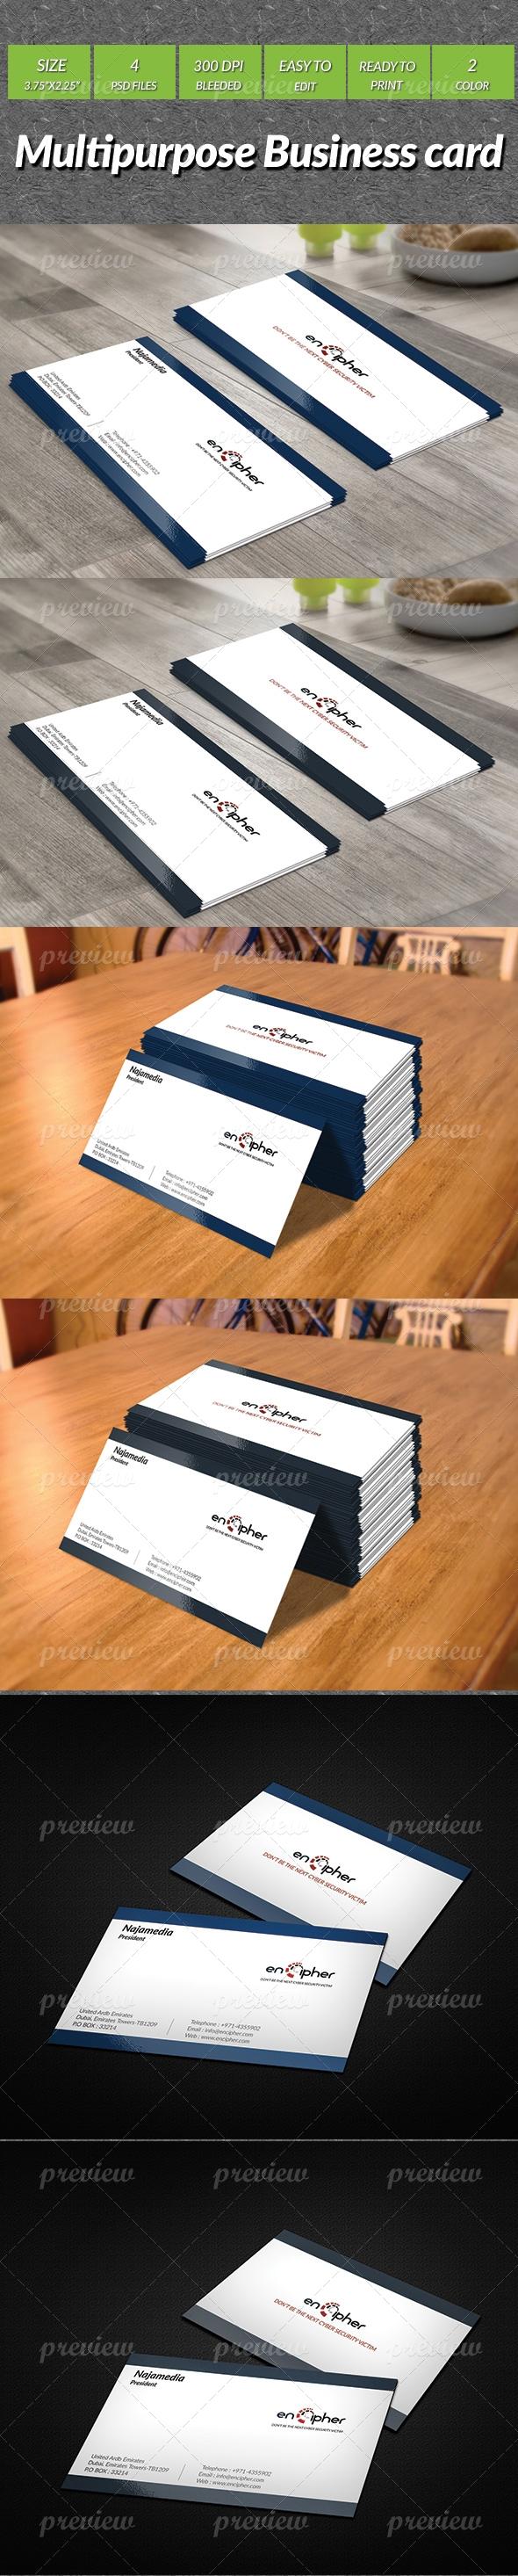 Multipurpose Business Card 4